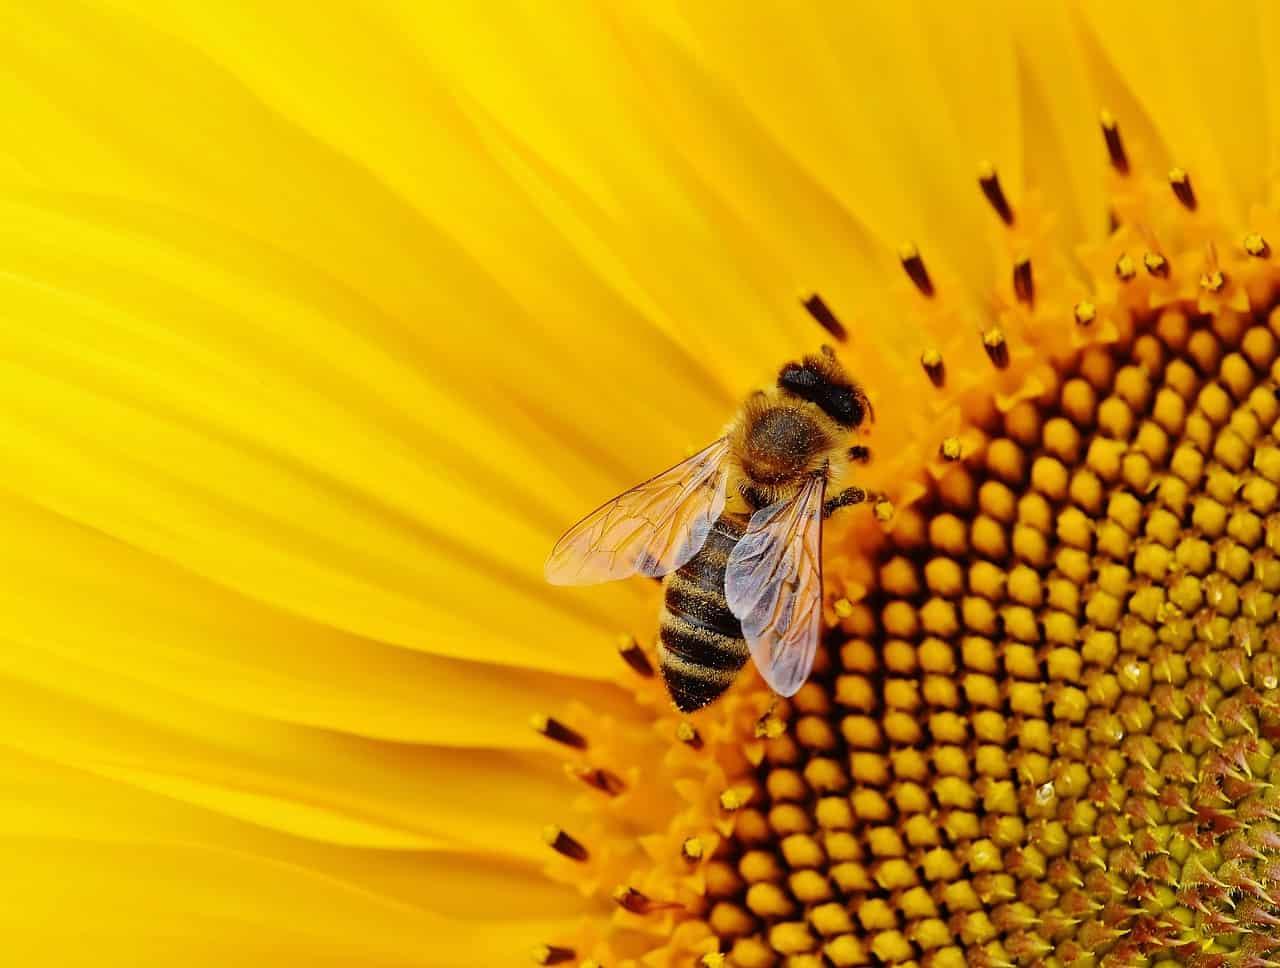 sunflower, bee, sunflower facts